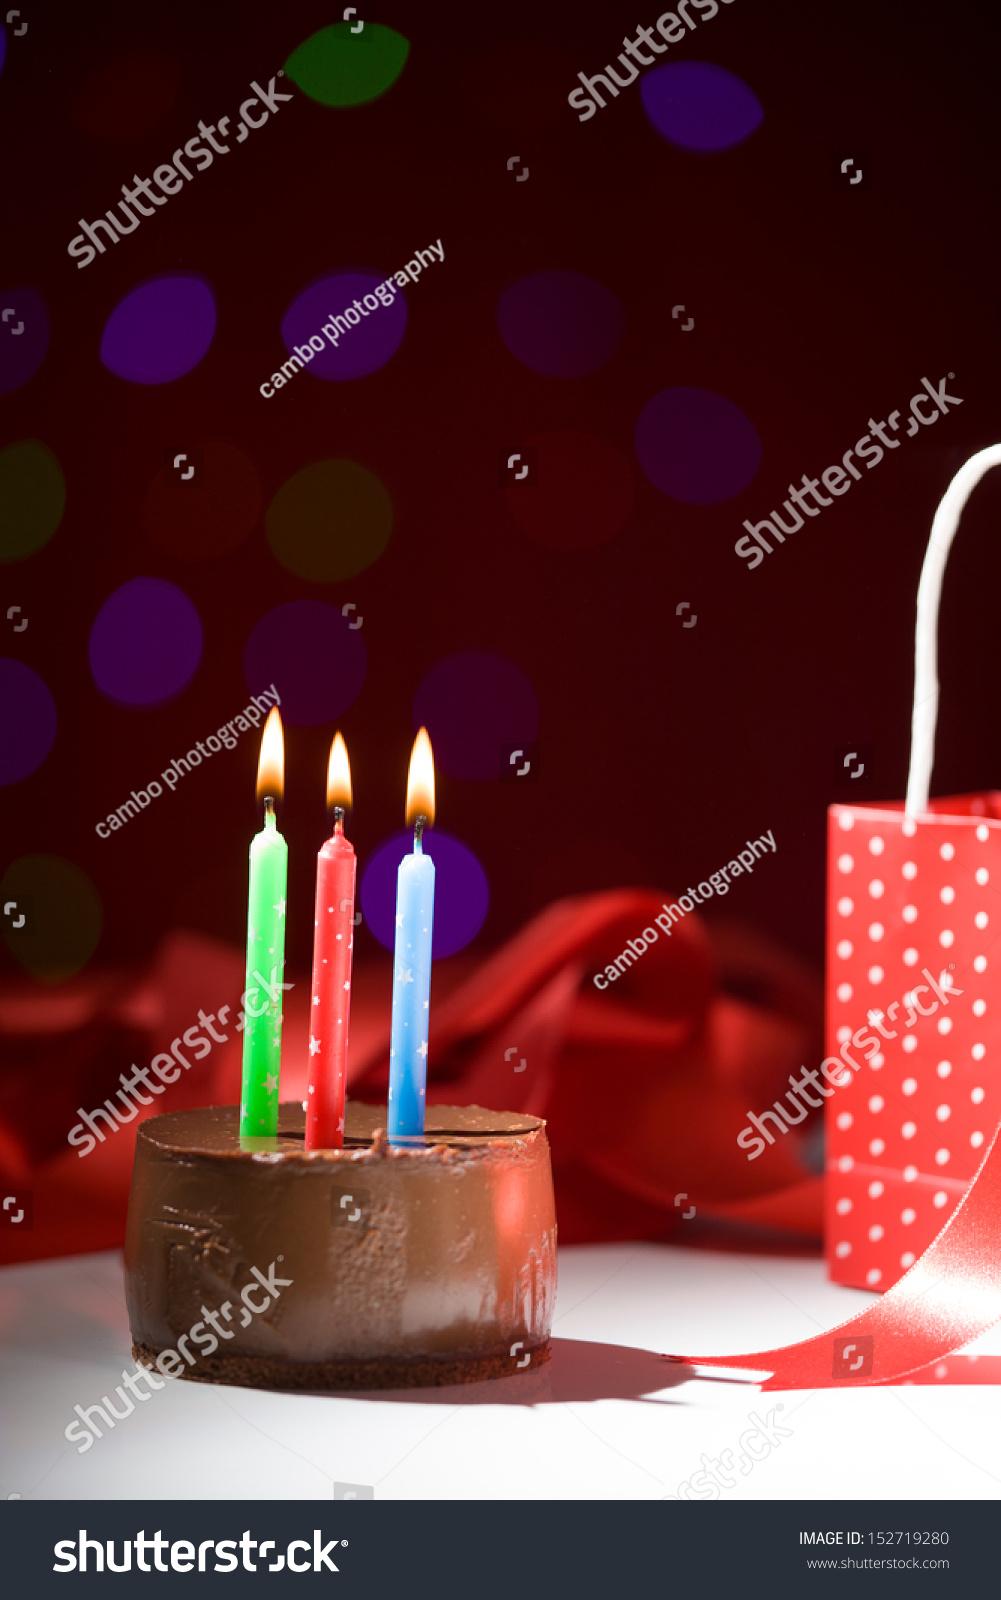 Happy Birthday Cake Shot On Red Stock Photo Royalty Free 152719280